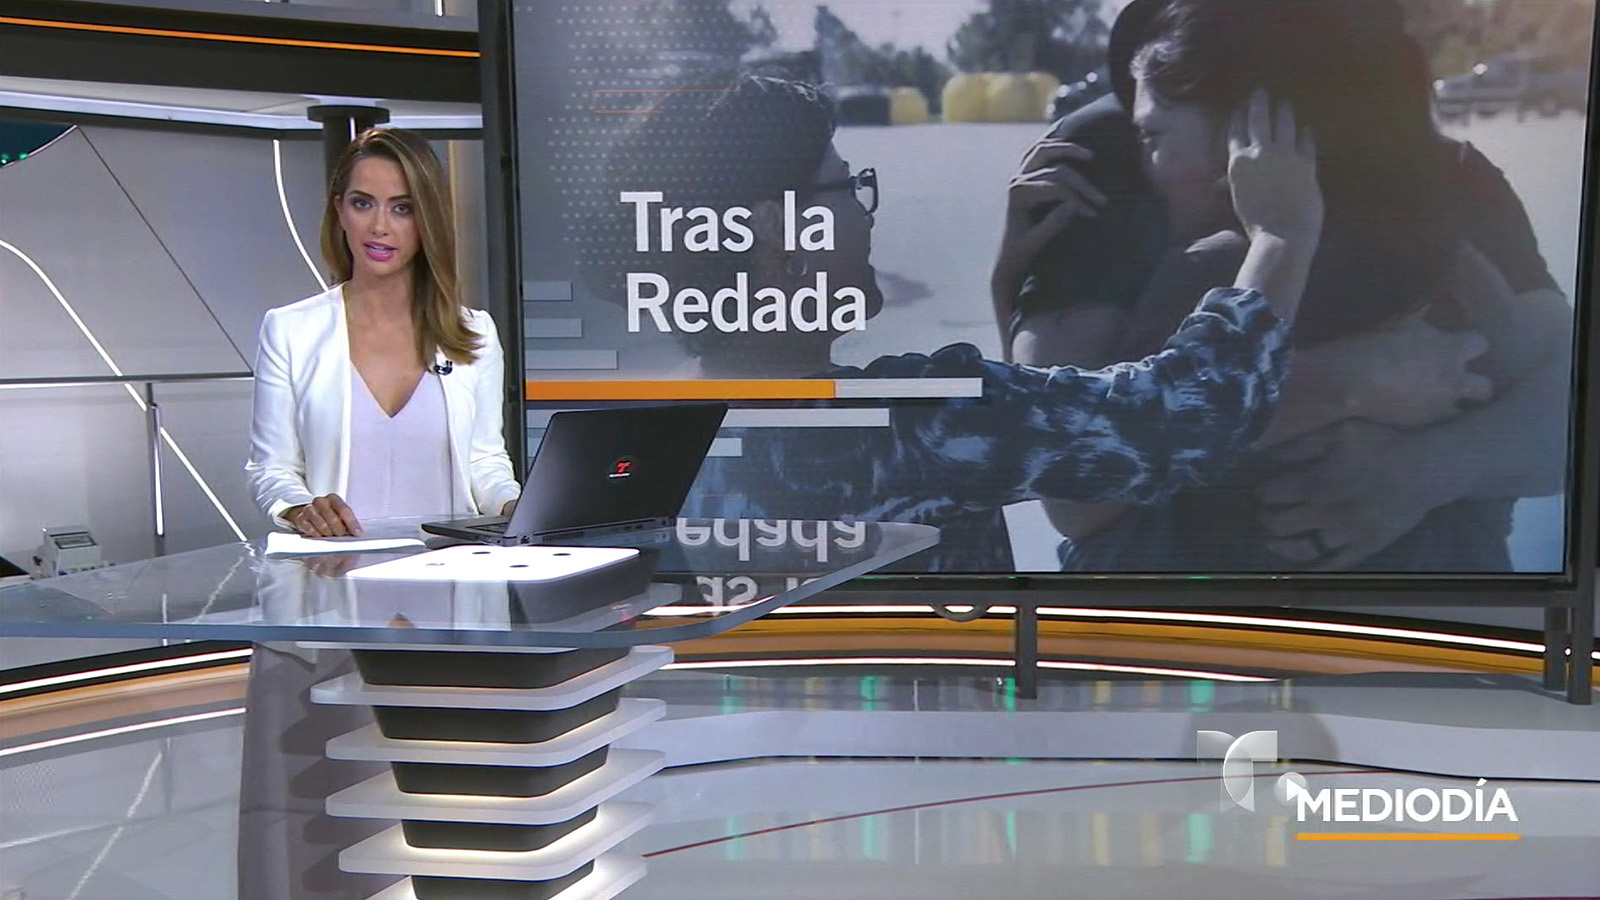 NCS_Noticias-Telemundo-Design_0022